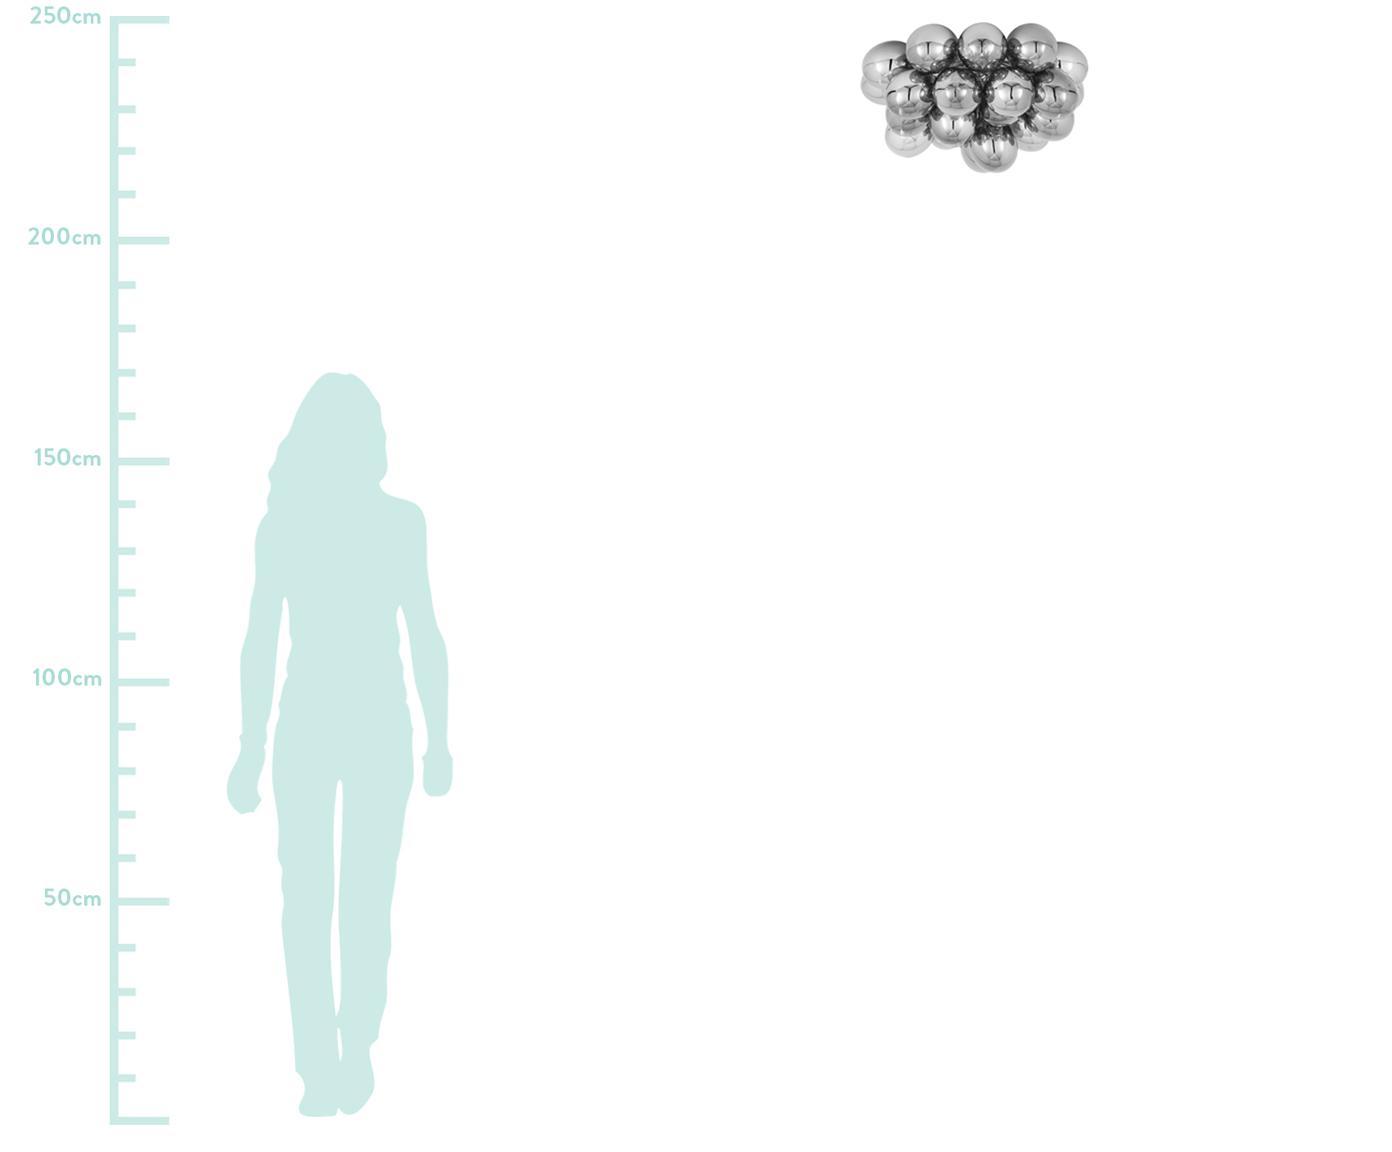 Plafondlamp Gross met glazen bollen, Chroomkleurig, Ø 50 x H 27 cm